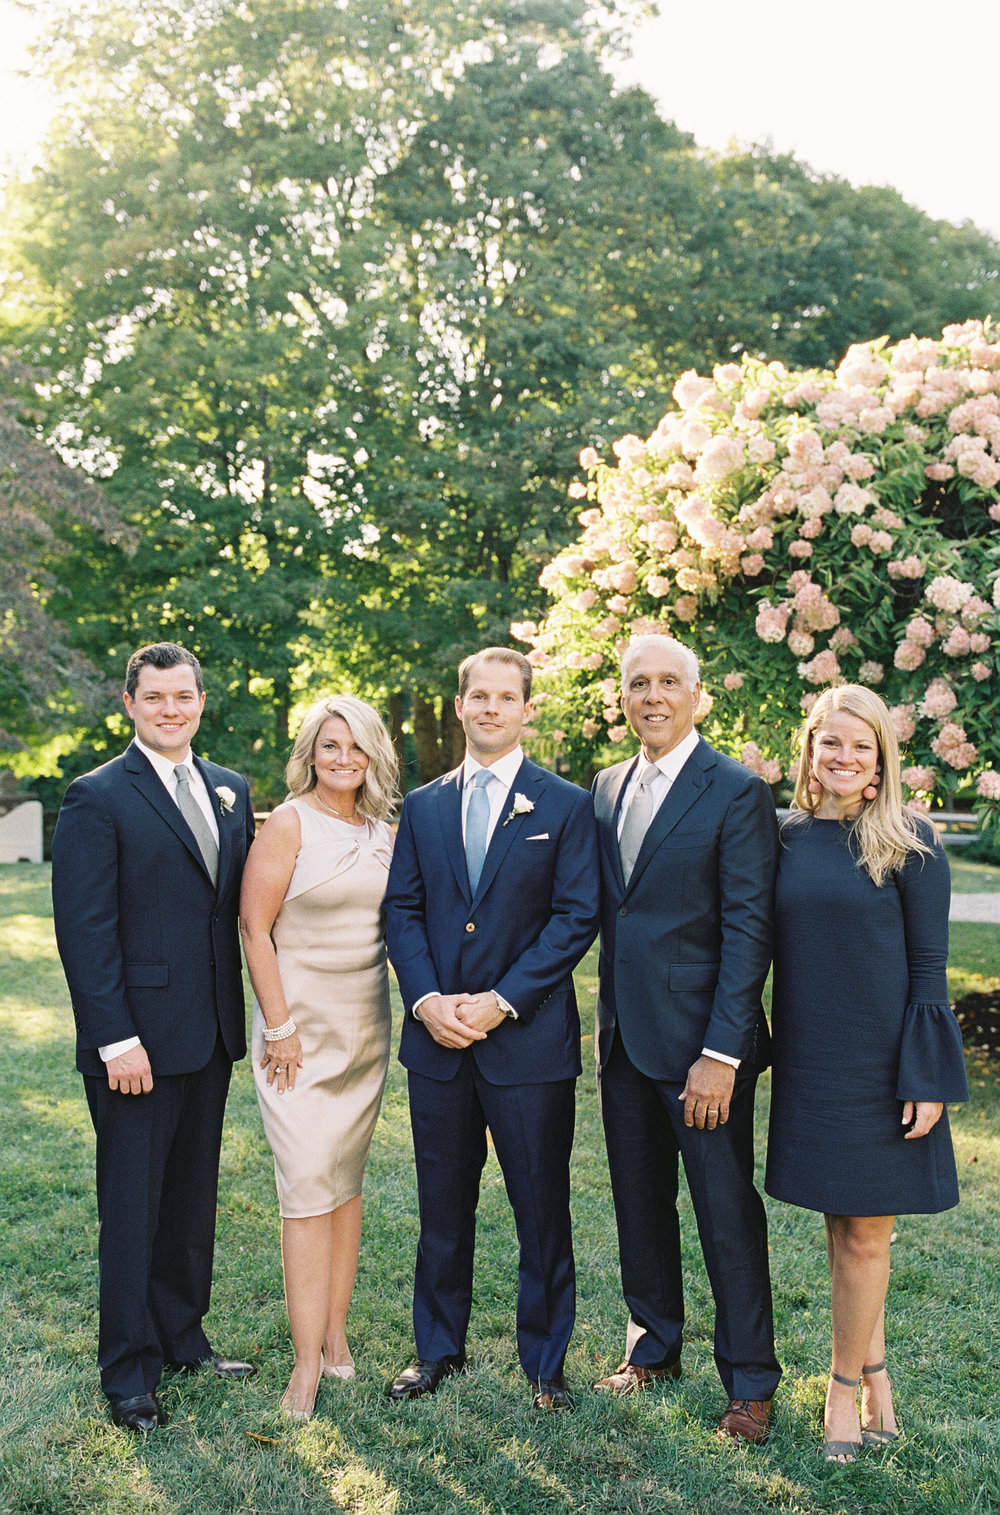 Connecticut-Wedding-34-Jen-Huang-20170909-KB-193-Jen_Huang-006797-R1-031.jpg